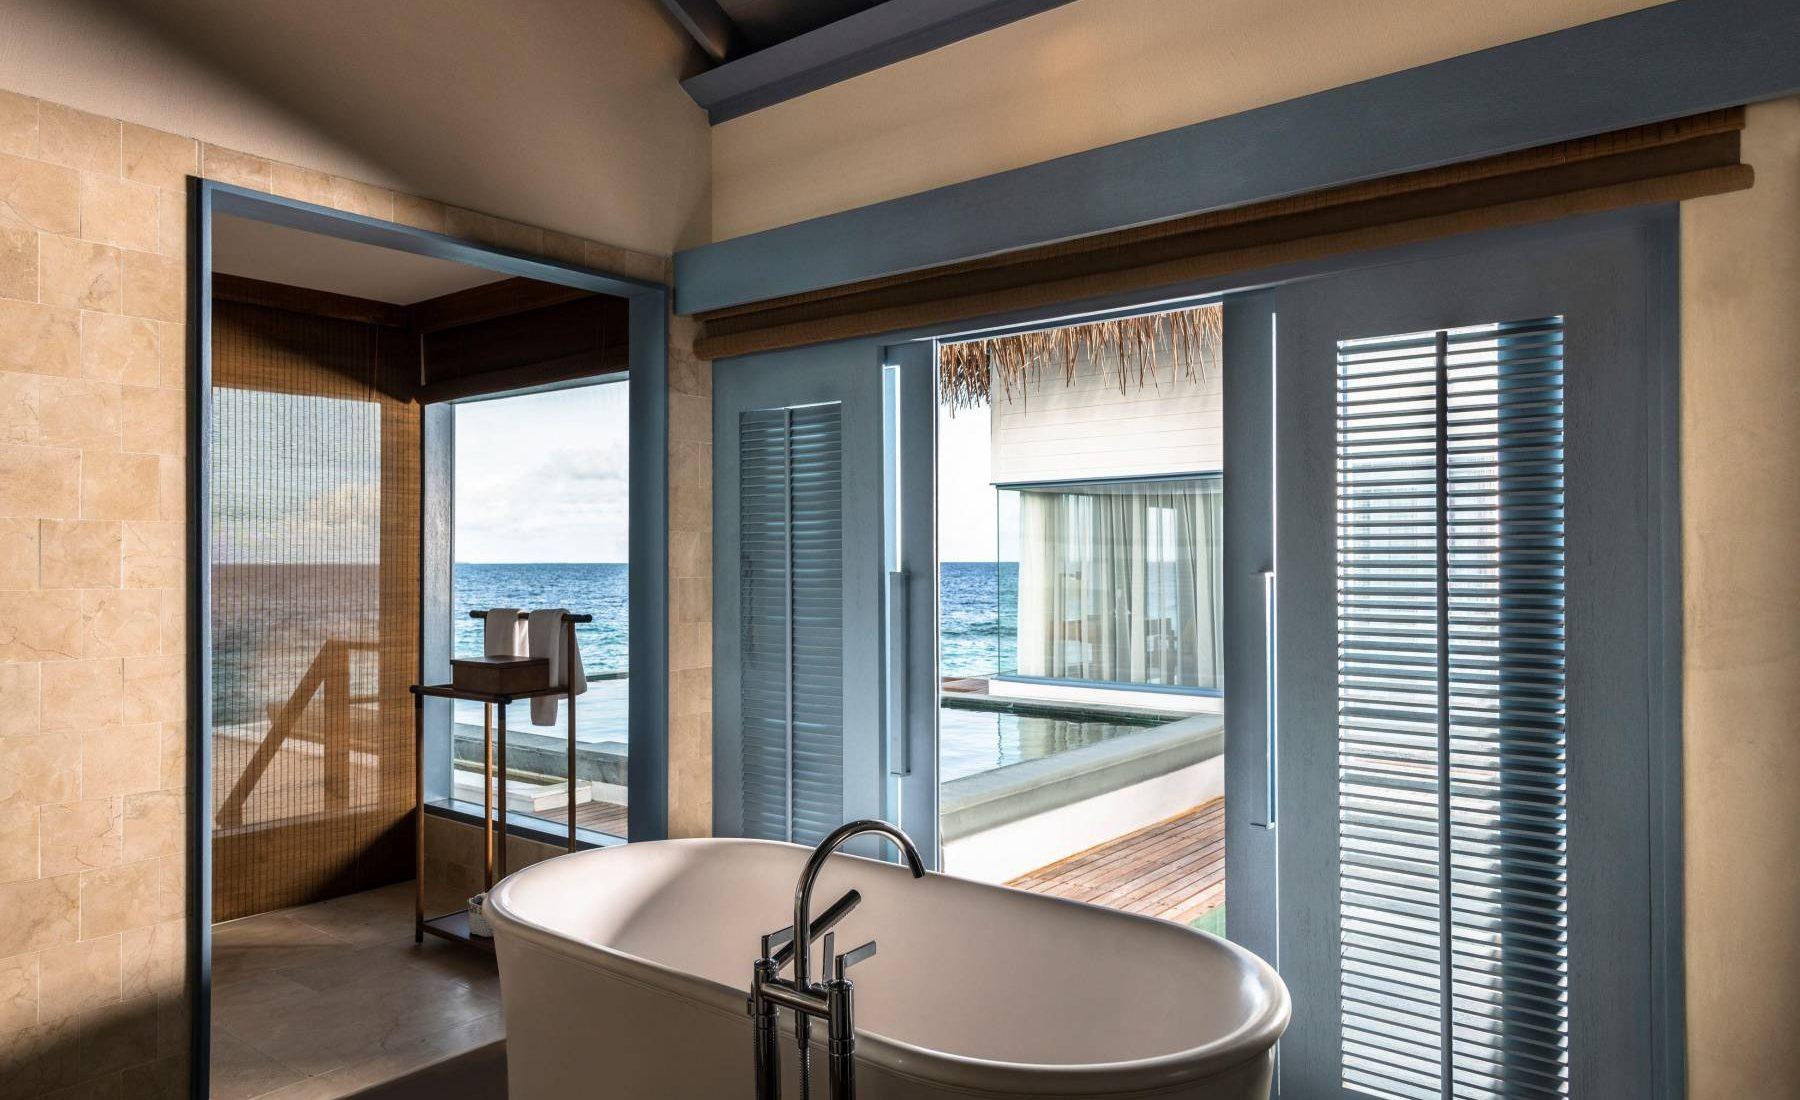 Raffles Maldives Meradhoo - Overwater Villa with Private Pool